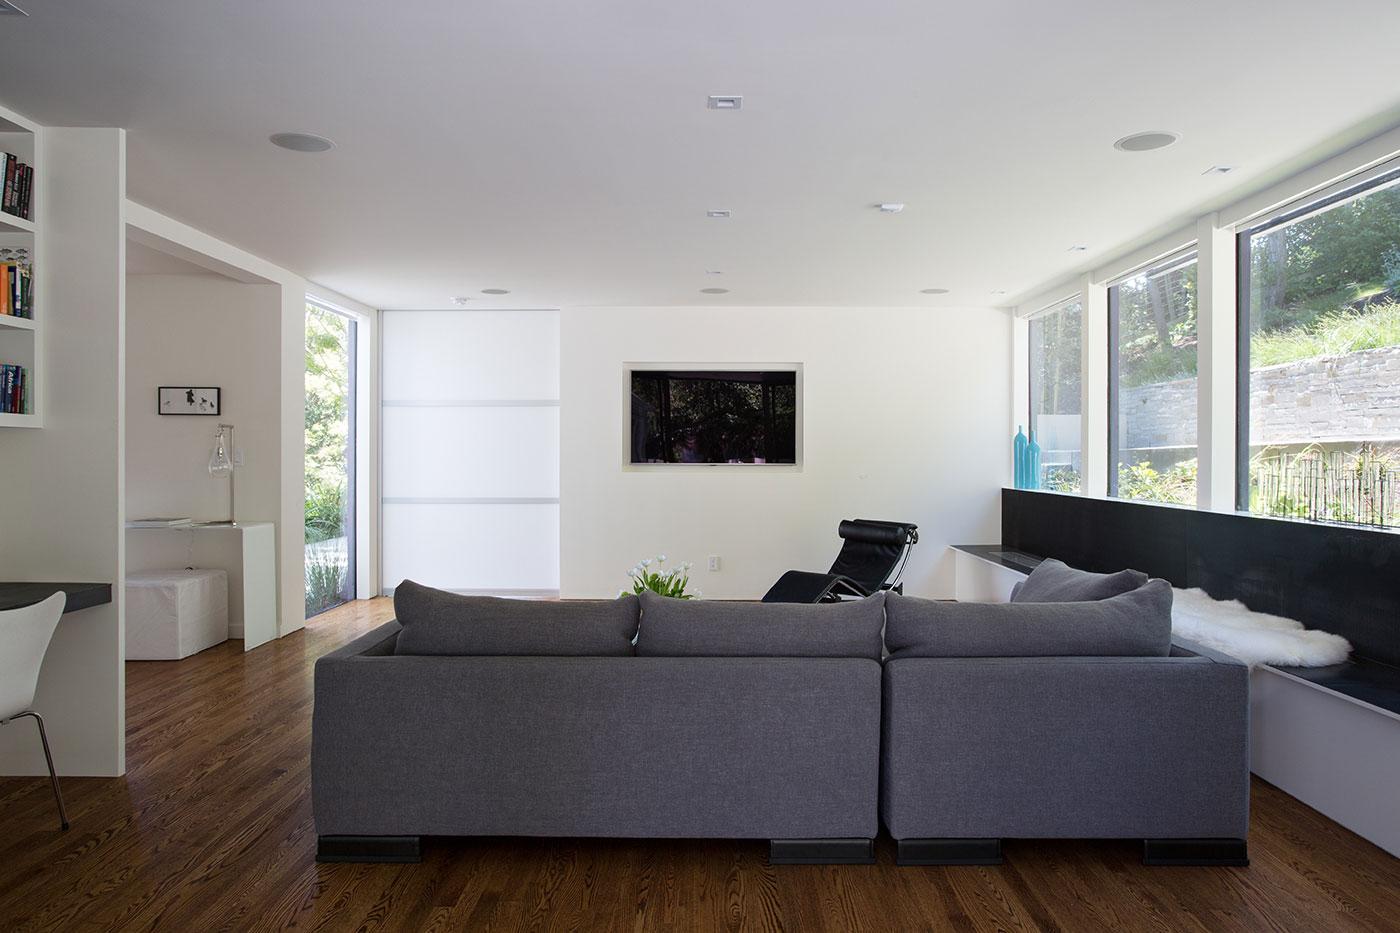 Minimal Modern Addition Home with Dark Grey Stuccoed Walls by Klopf Architecture-08